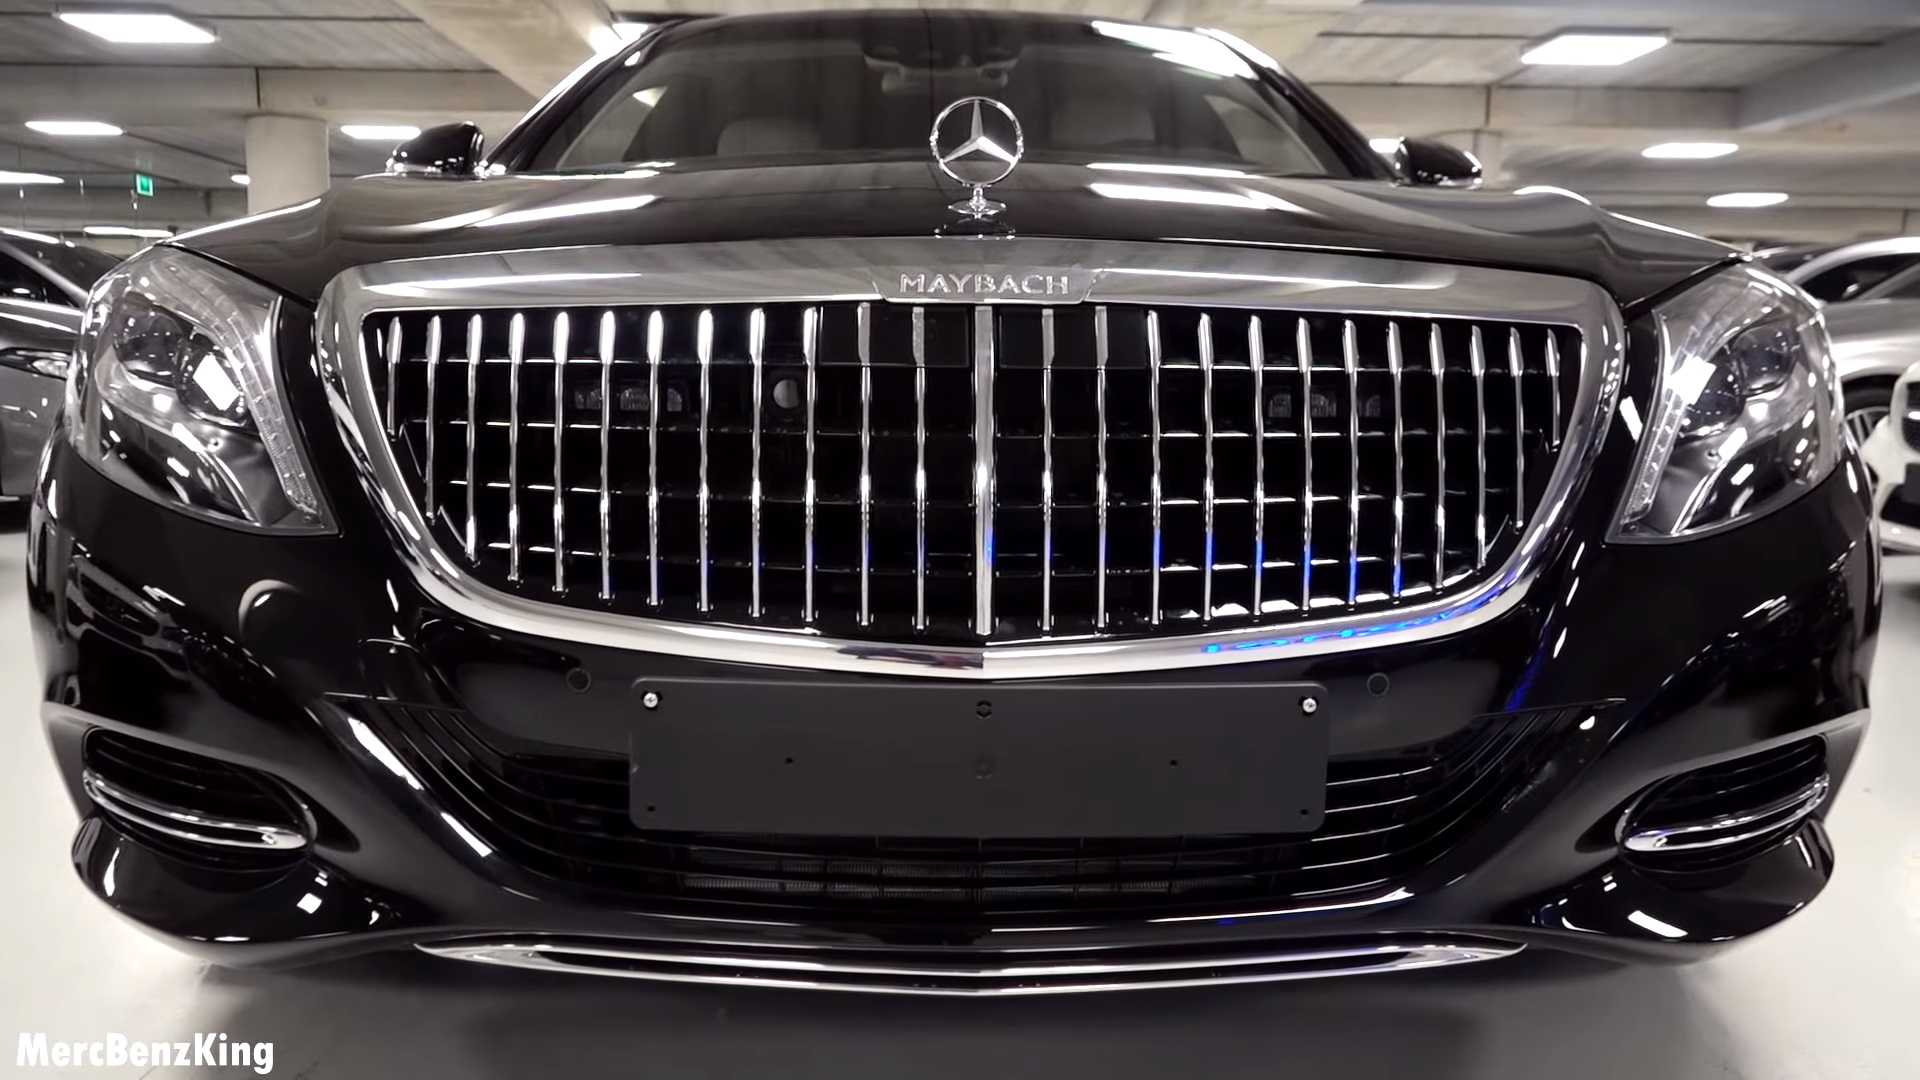 Meet the 2019 Mercedes-Maybach S600 Pullman Guard • neoAdviser